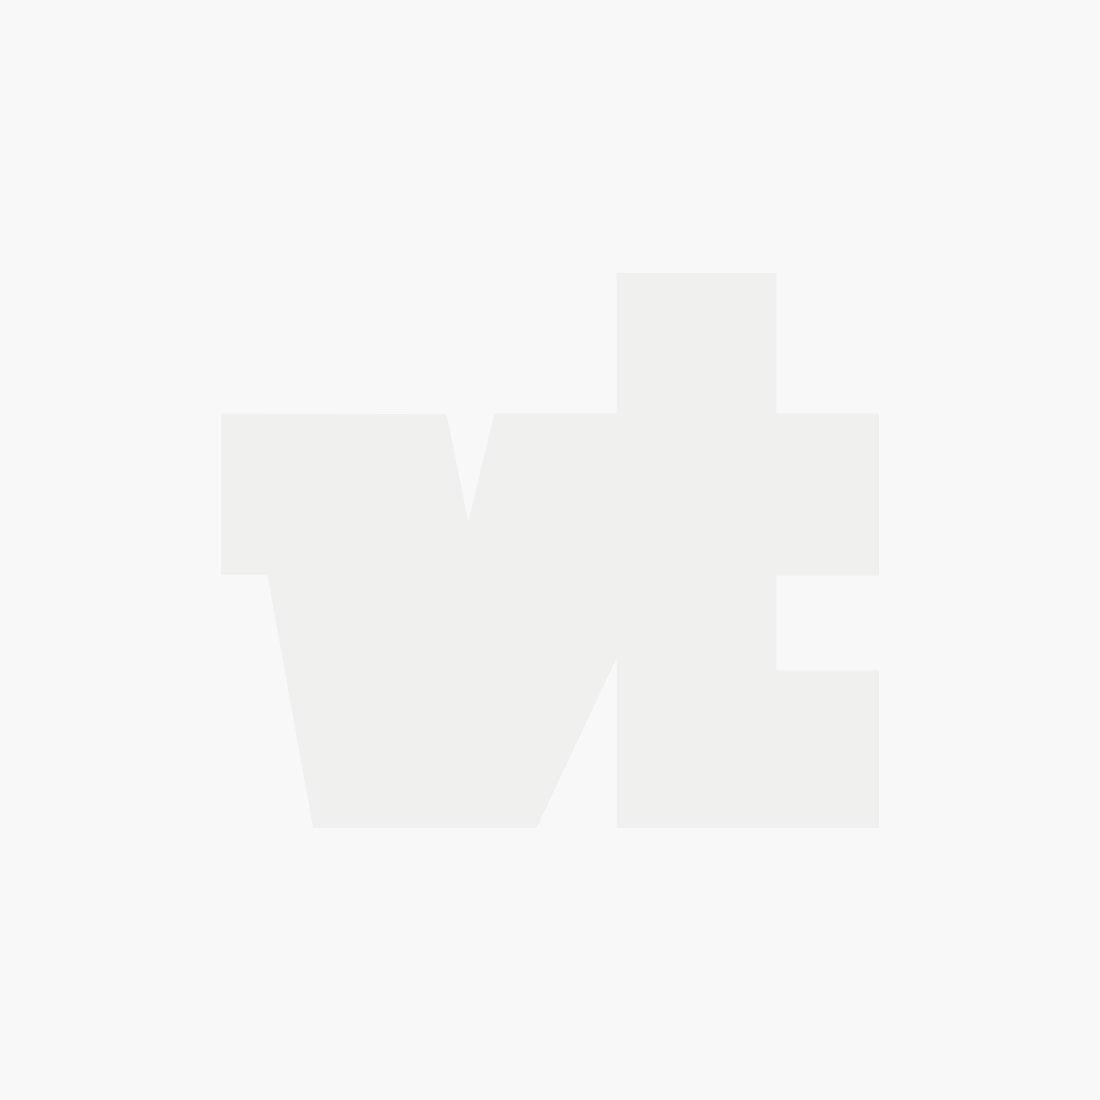 Celest sneaker brown multi